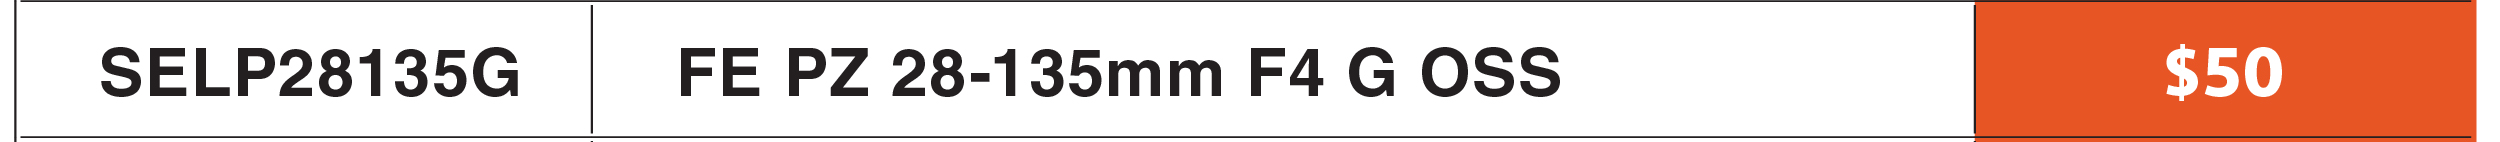 Sony FE PZ 28-135mm f/4 G